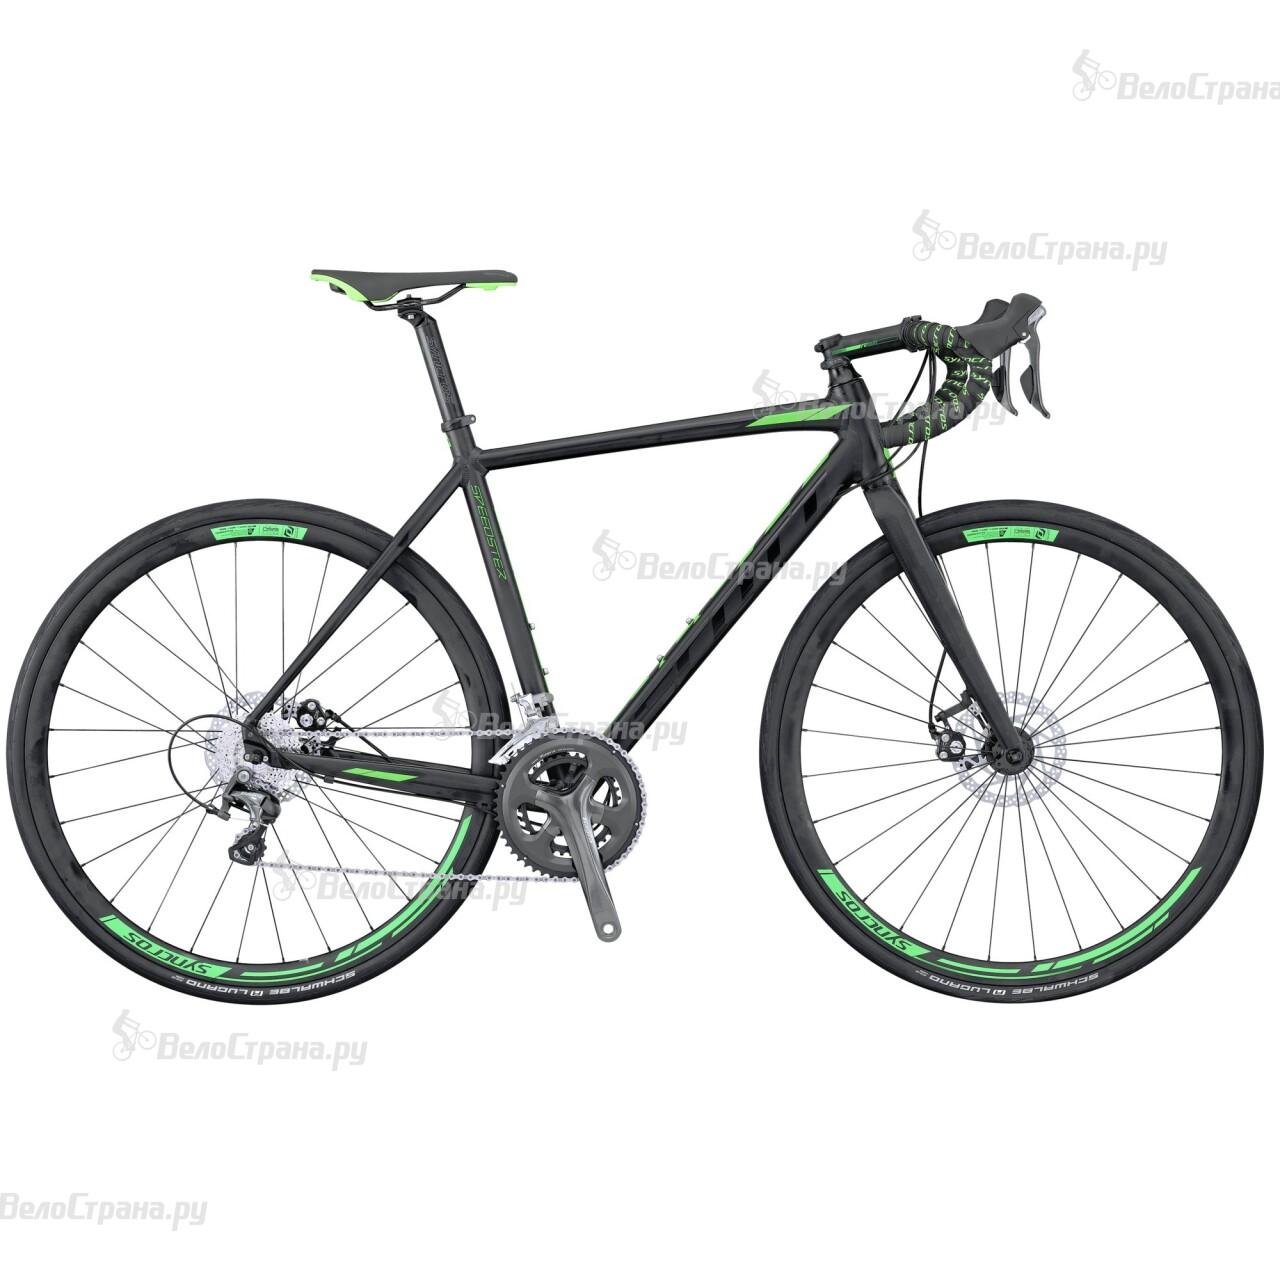 Велосипед Scott Speedster 30 Disc (2016) велосипед scott speedster cx 20 disc 28 2016